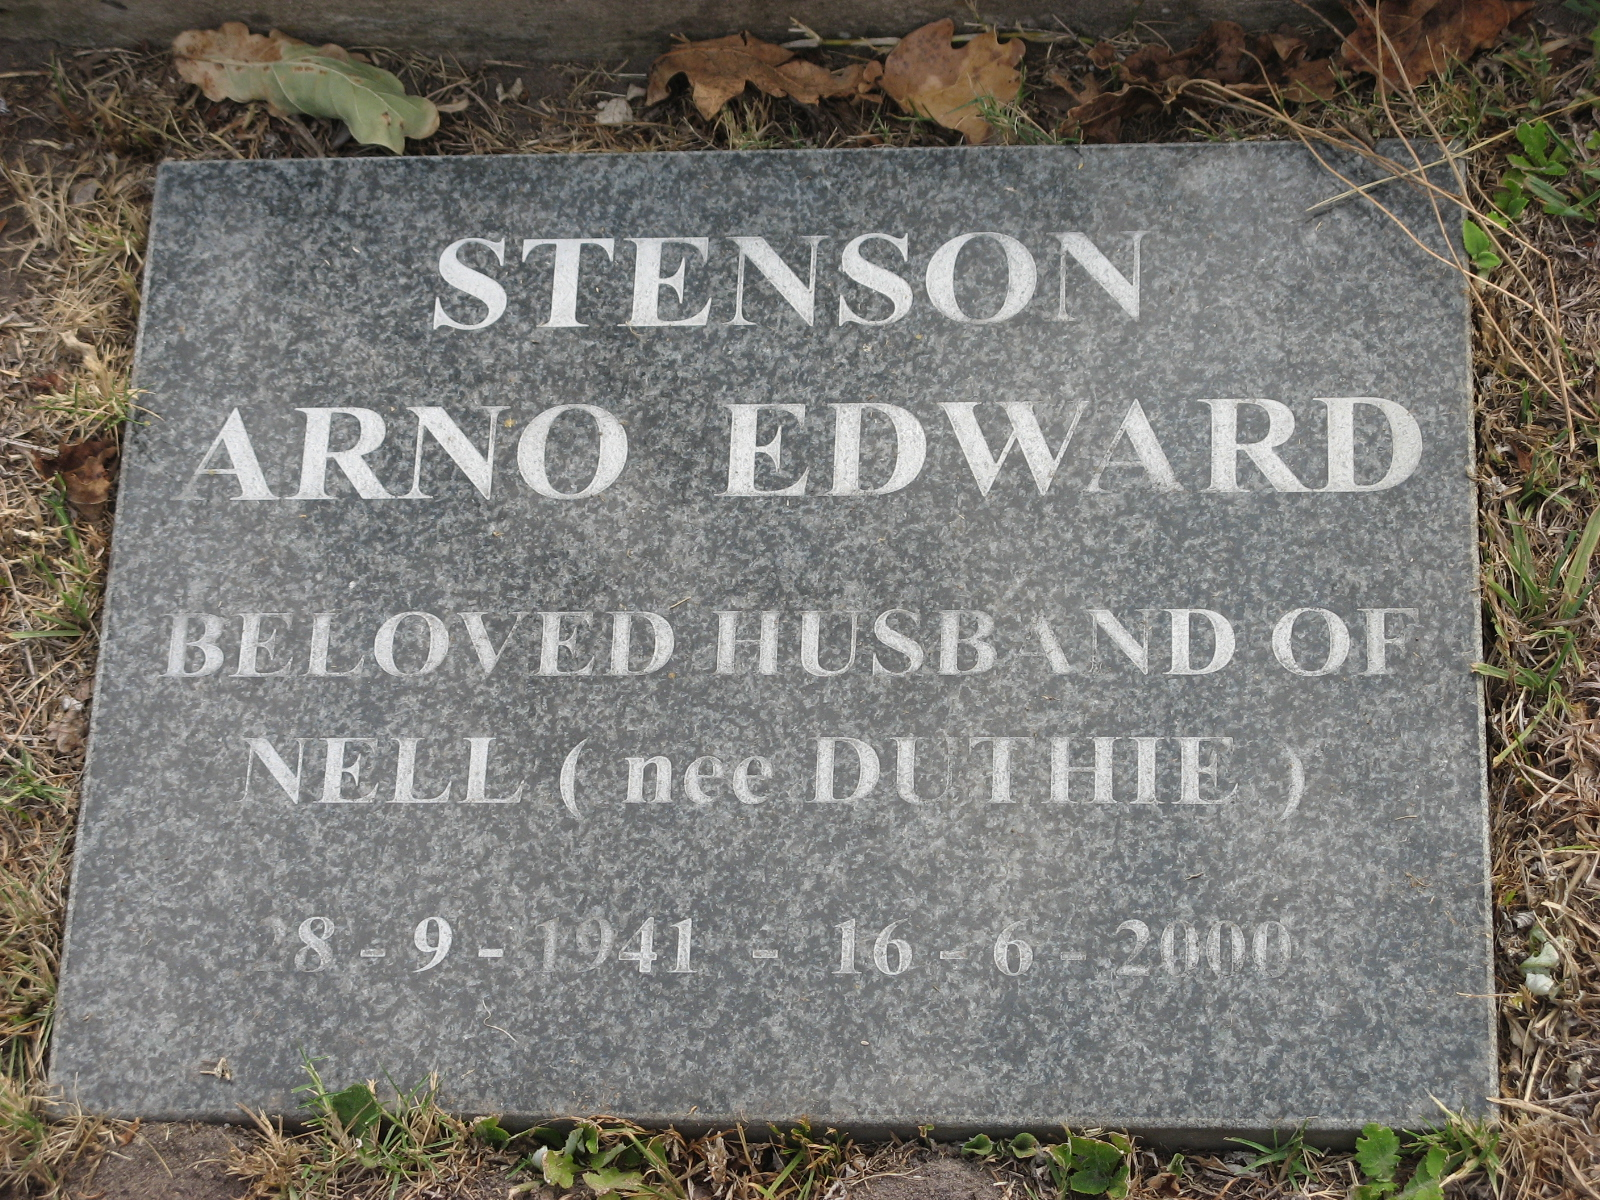 Stenson, Arno Edward